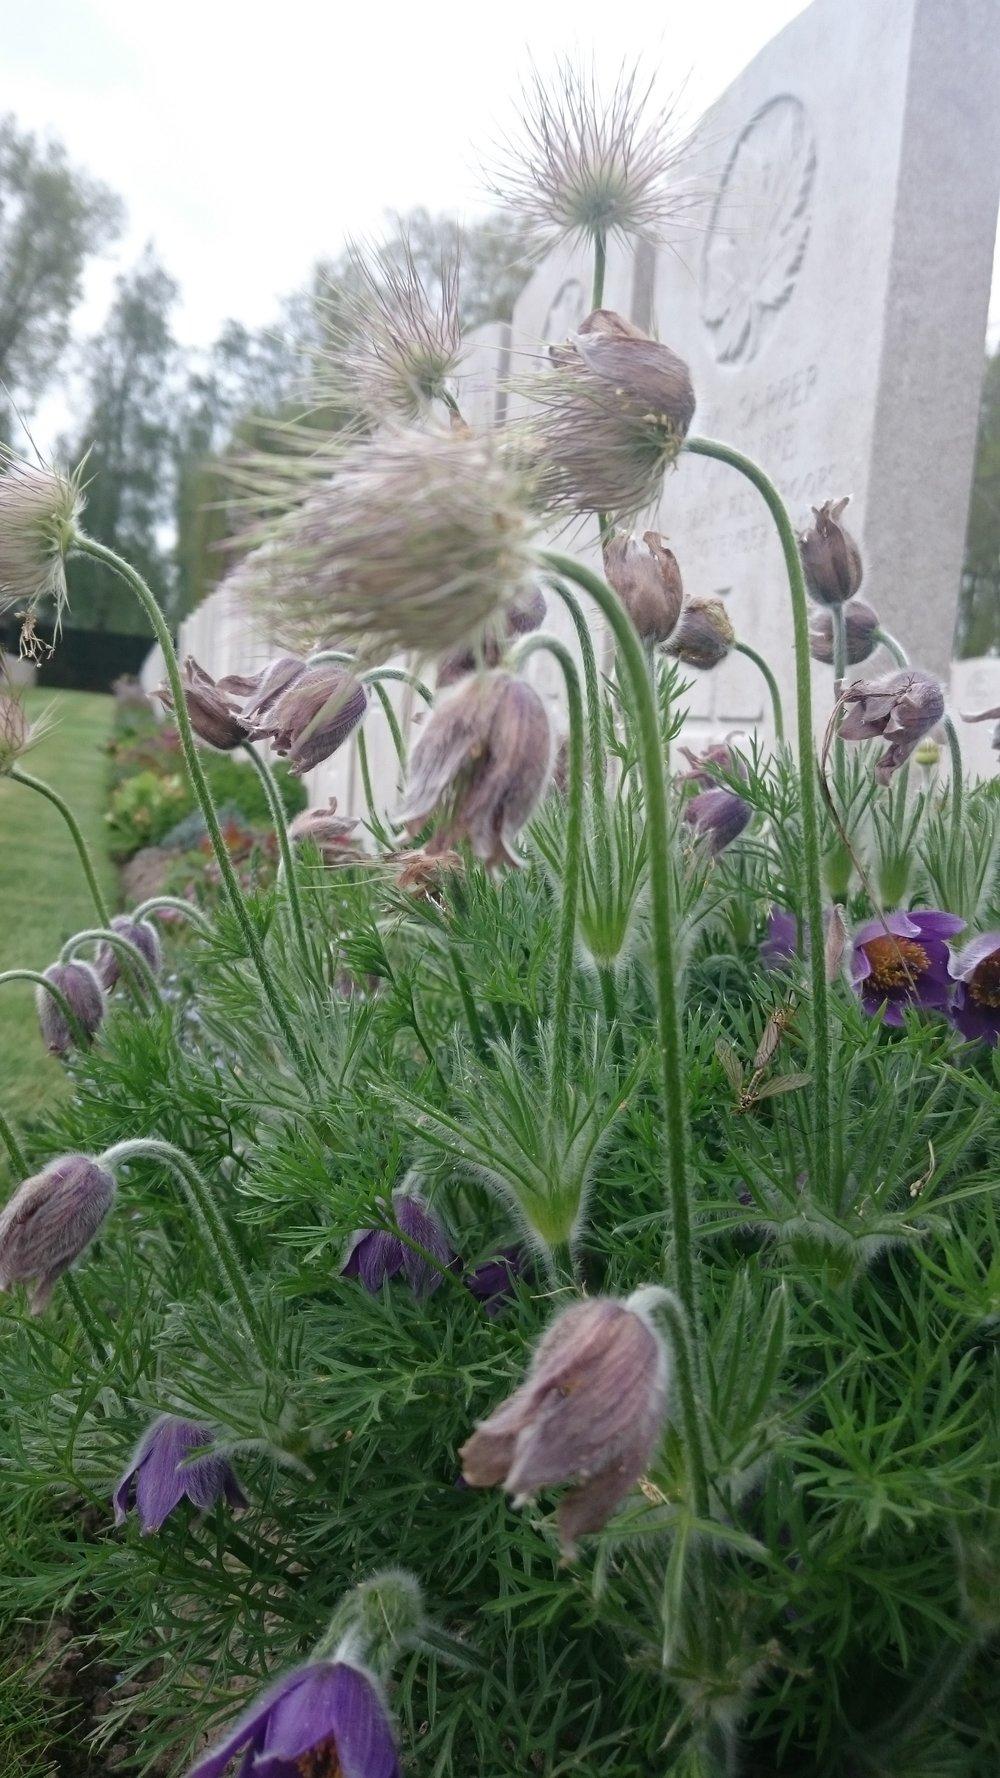 Pulsatillas in the beautifully kept borders at CWGC Lijssenthoek Military Cemetery